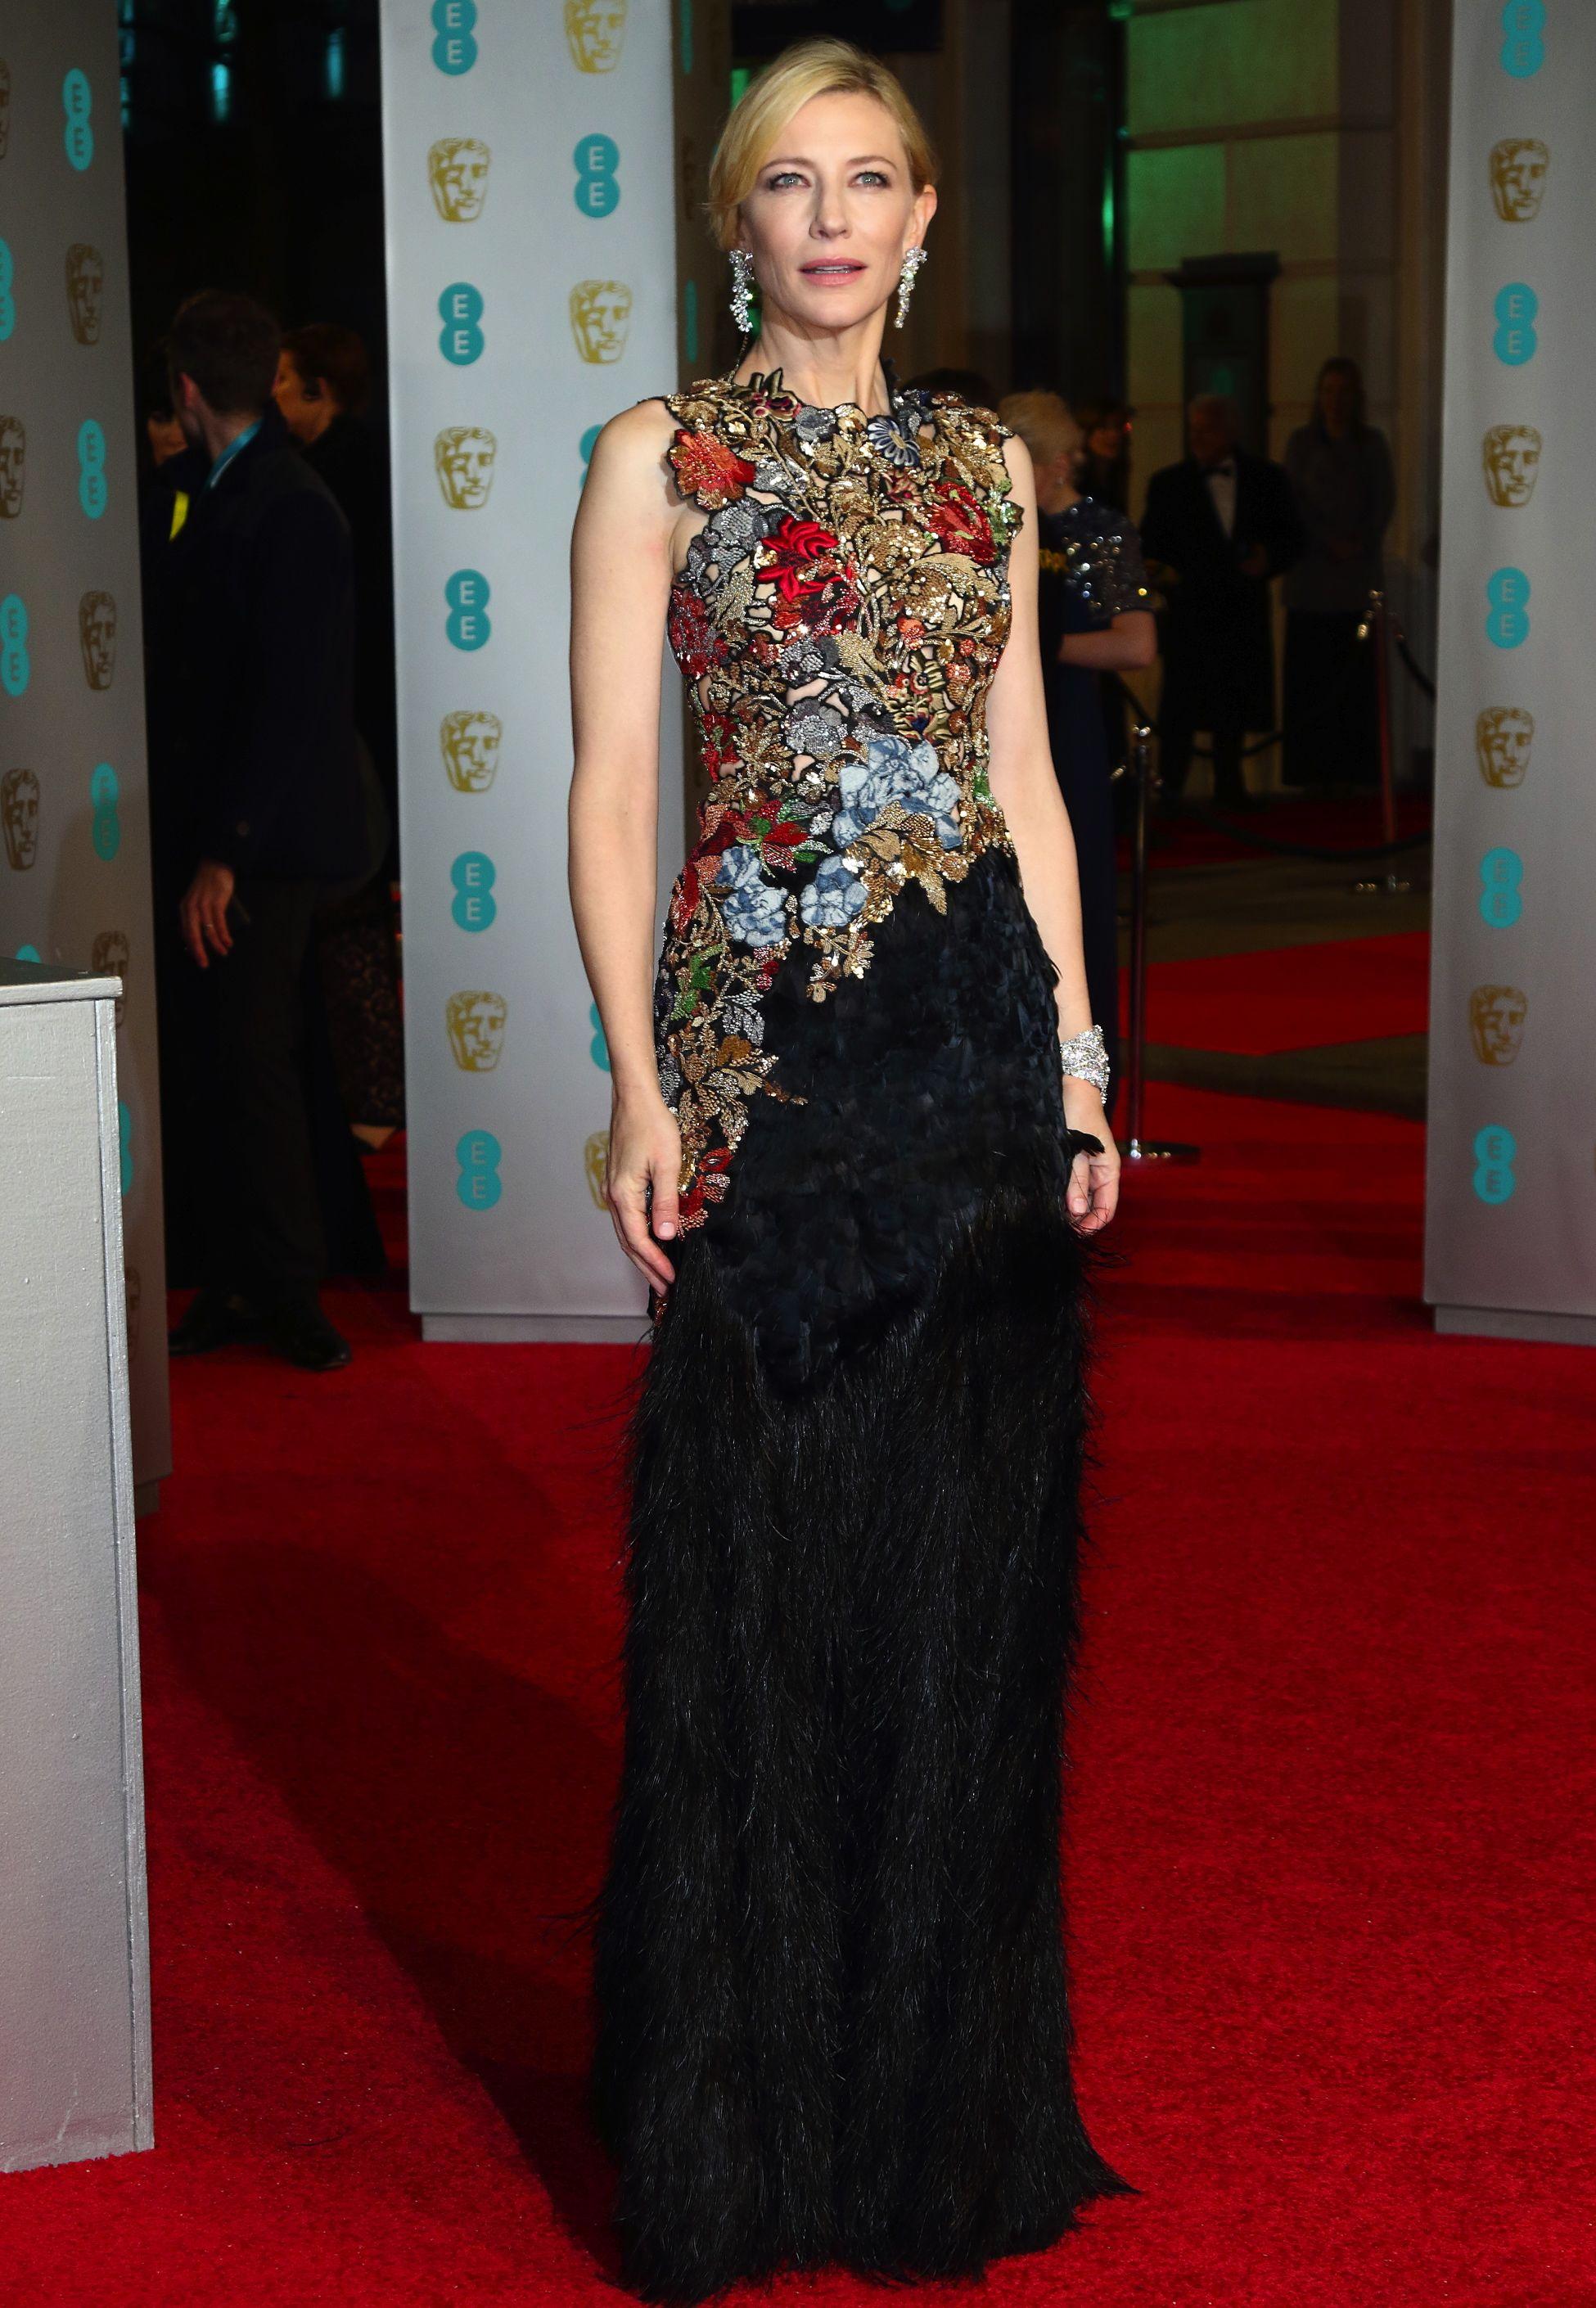 Best: Cate Blanchett